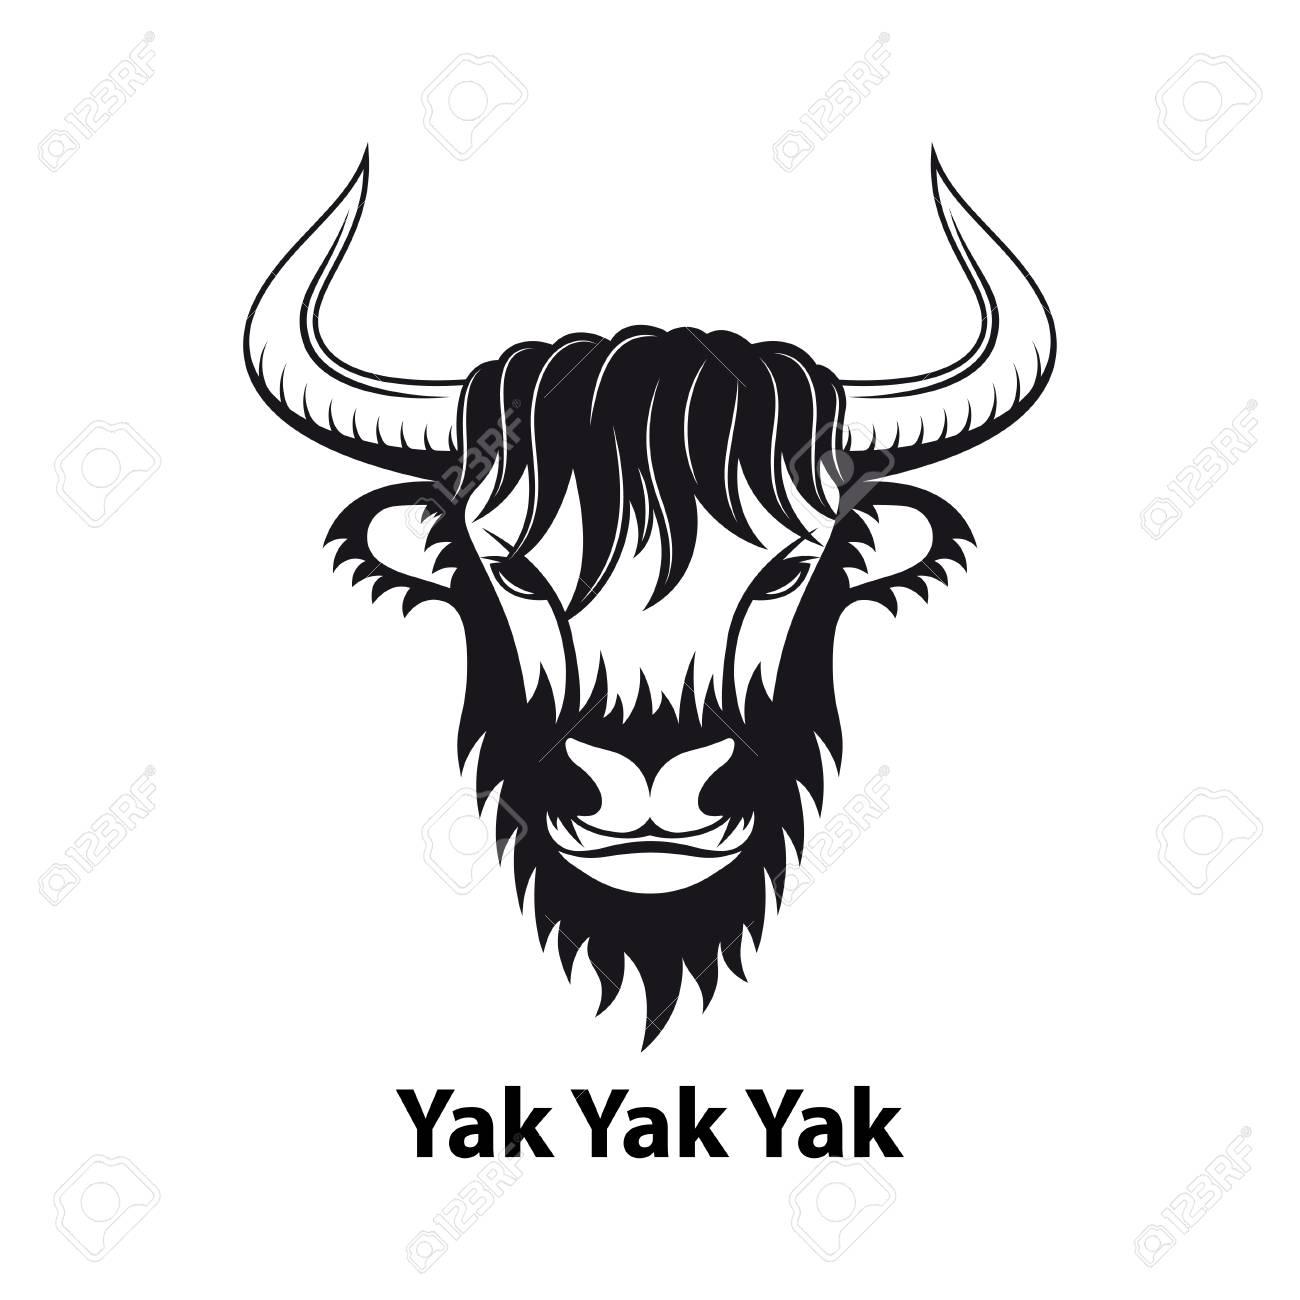 Yak Clipart Black And White Wwwtopsimagescom